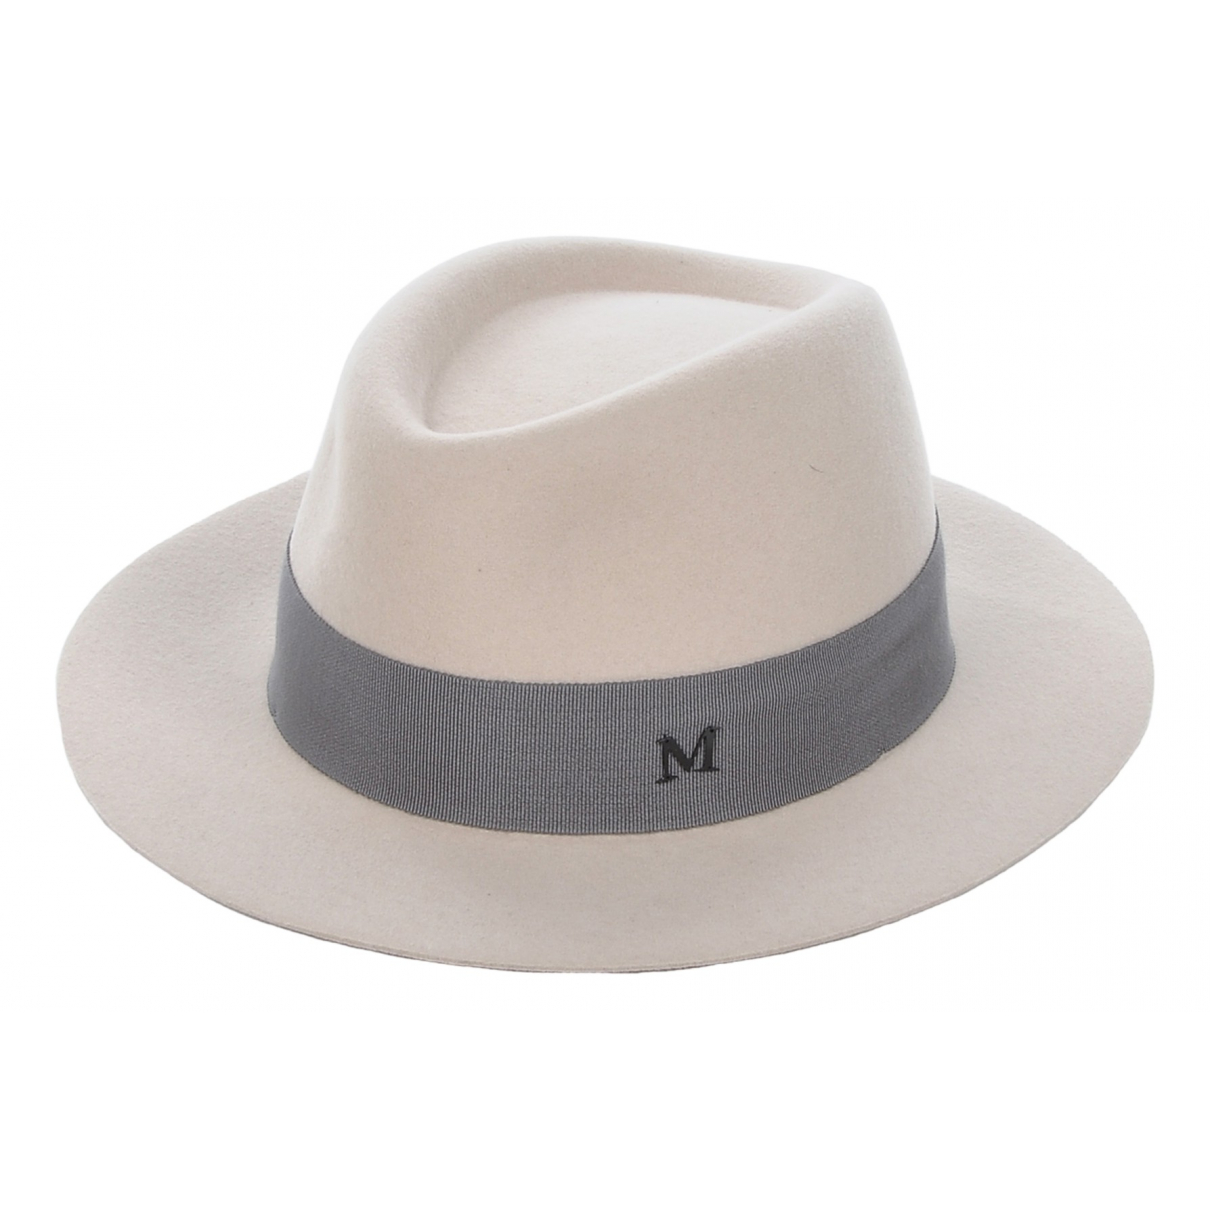 Sombrero Maison Michel